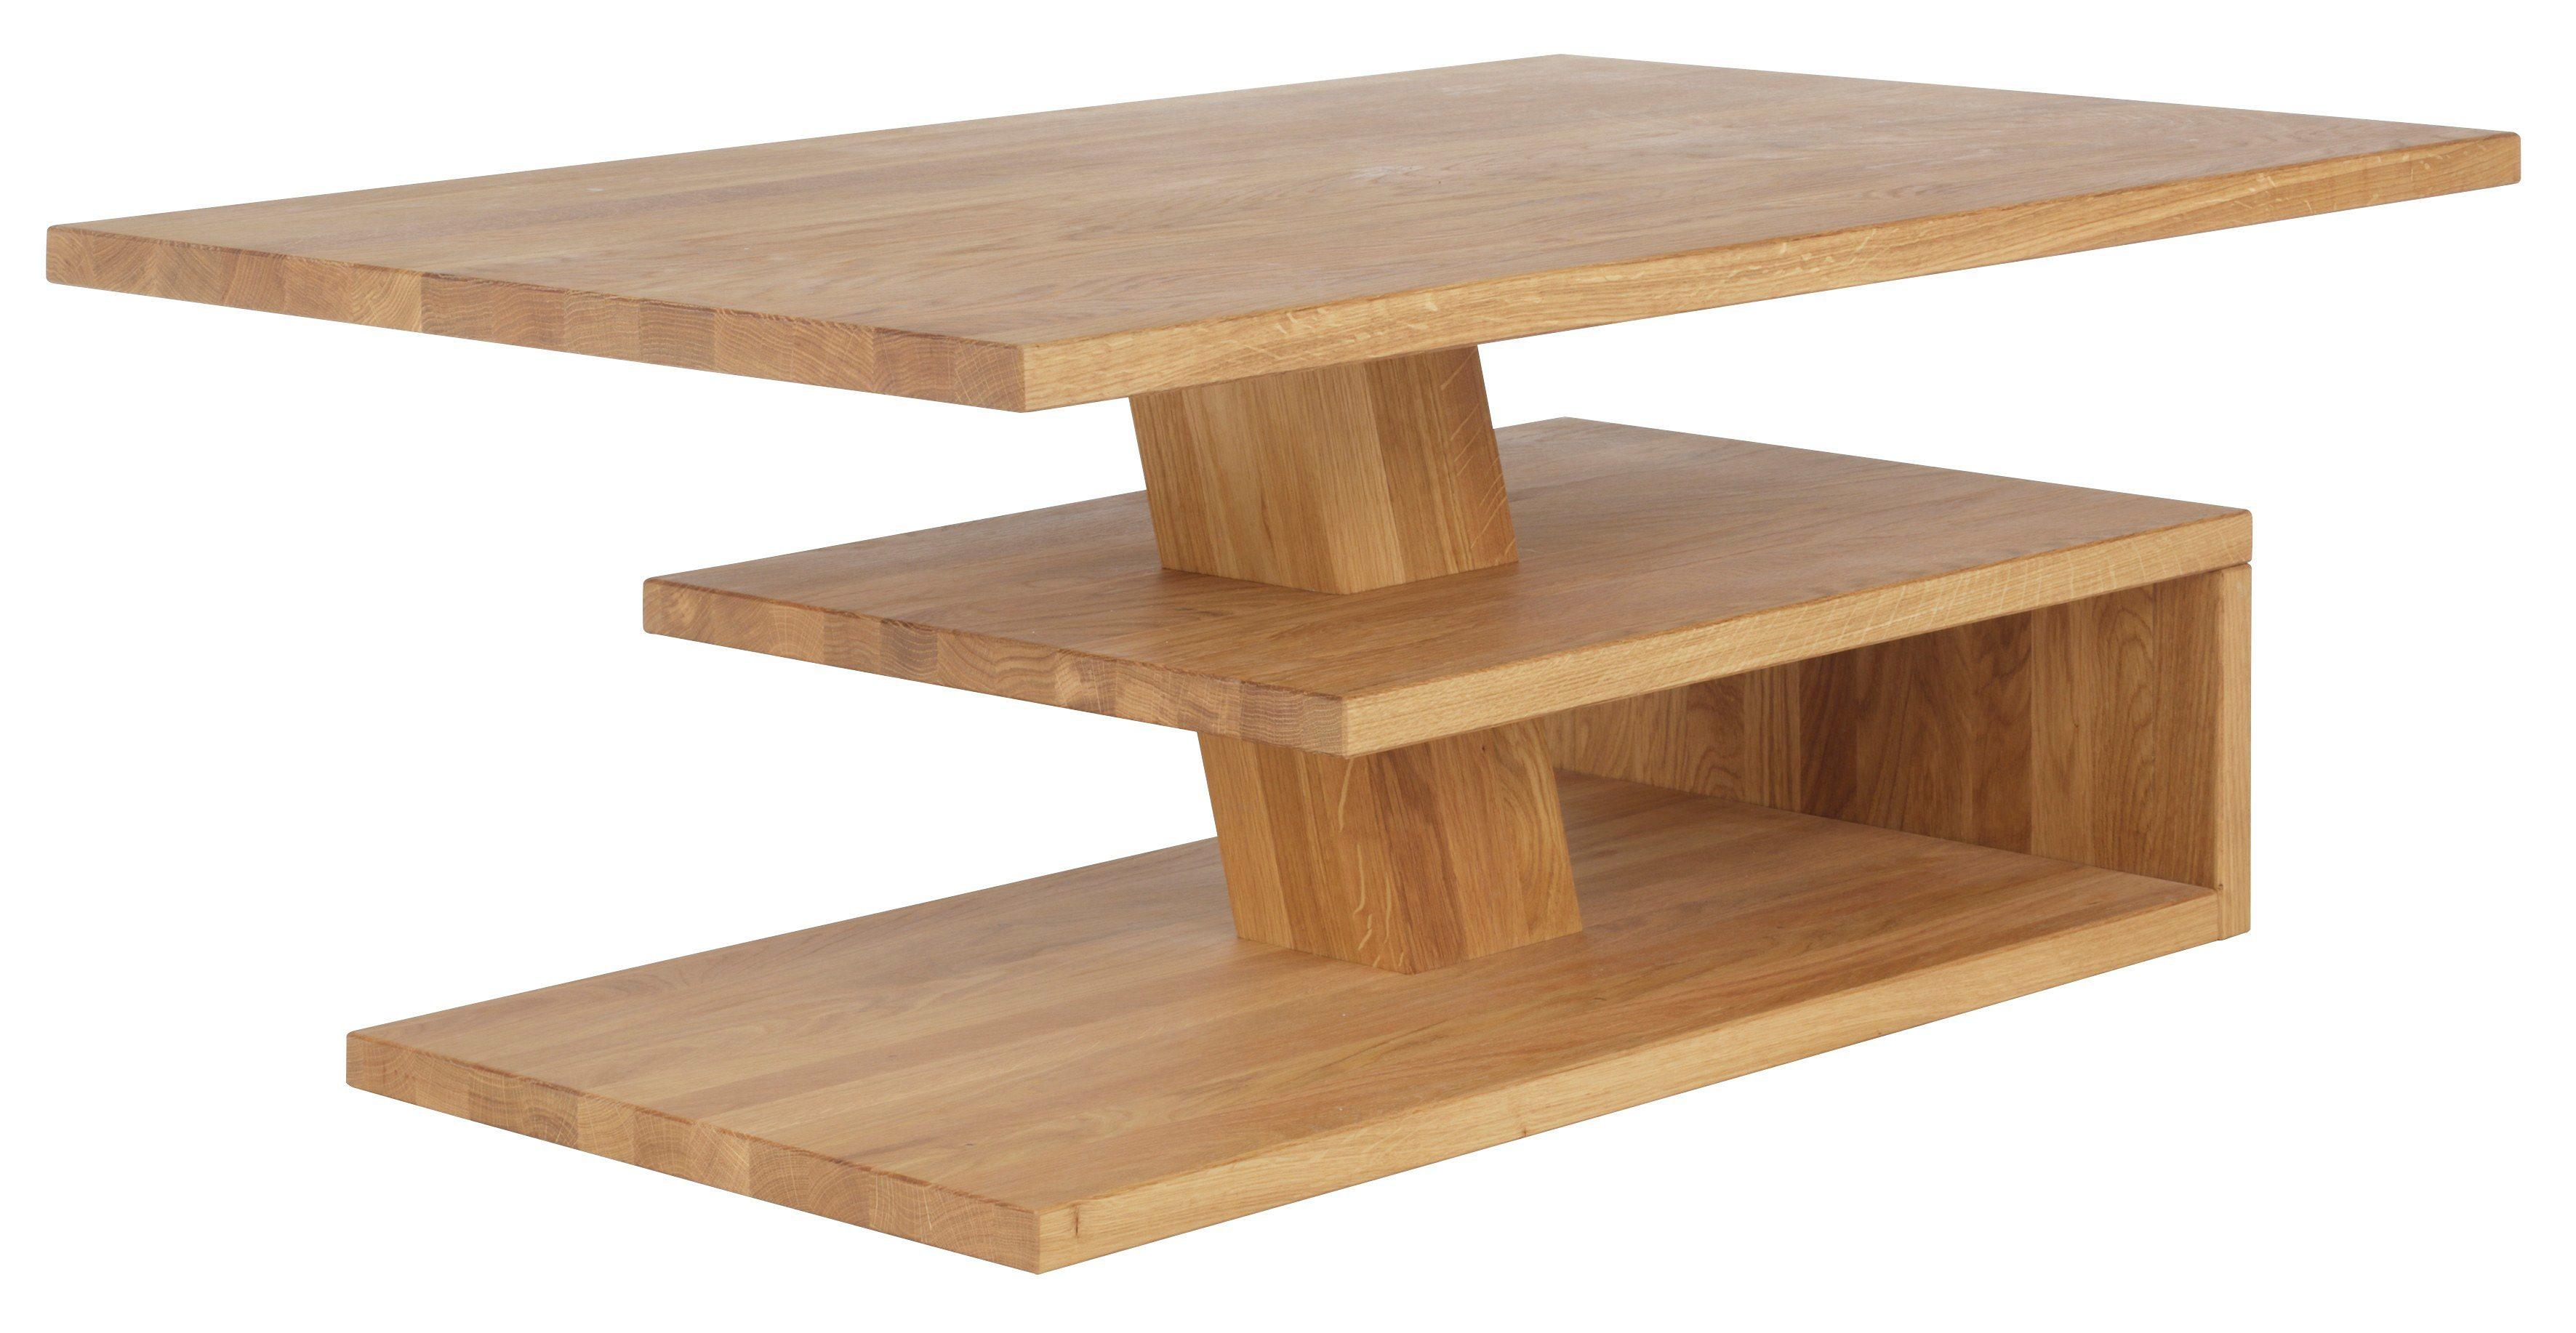 Salon Tafel Hout : Home affaire salontafel van massief hout koop je bij otto